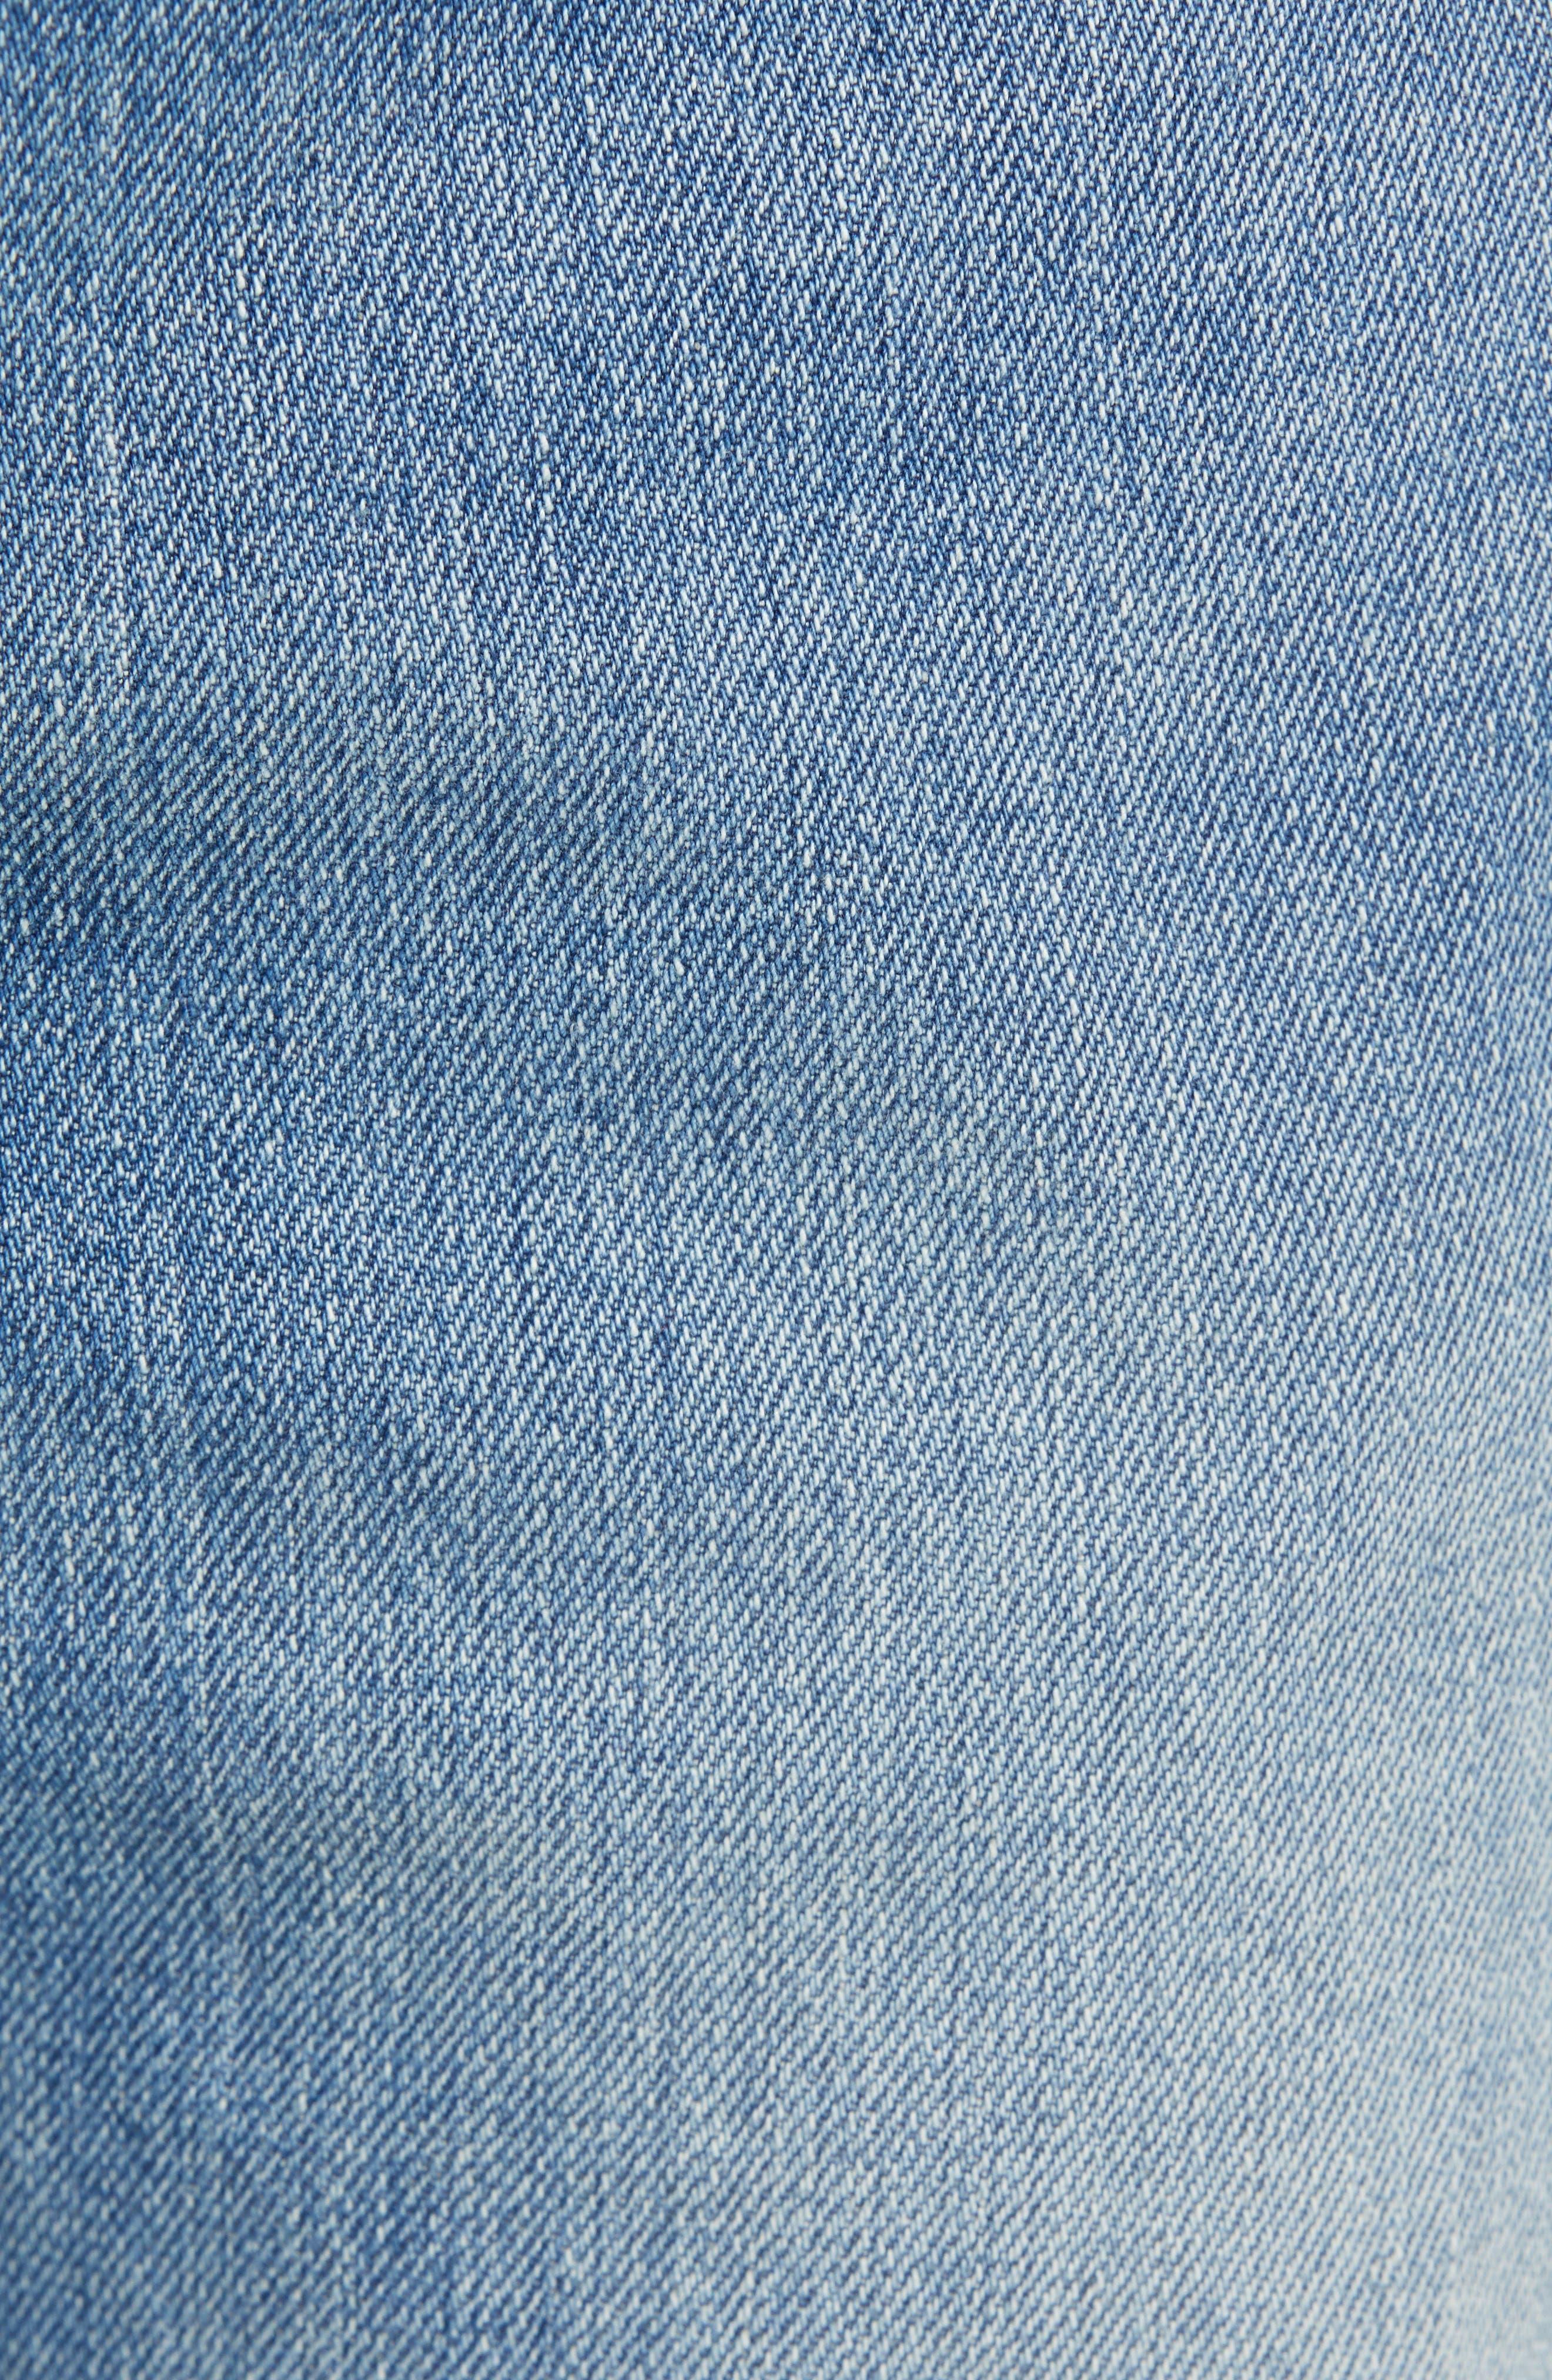 LEVI'S<SUP>®</SUP> VINTAGE CLOTHING, 1969 606<sup>™</sup> Slim Fit Jeans, Alternate thumbnail 5, color, 423